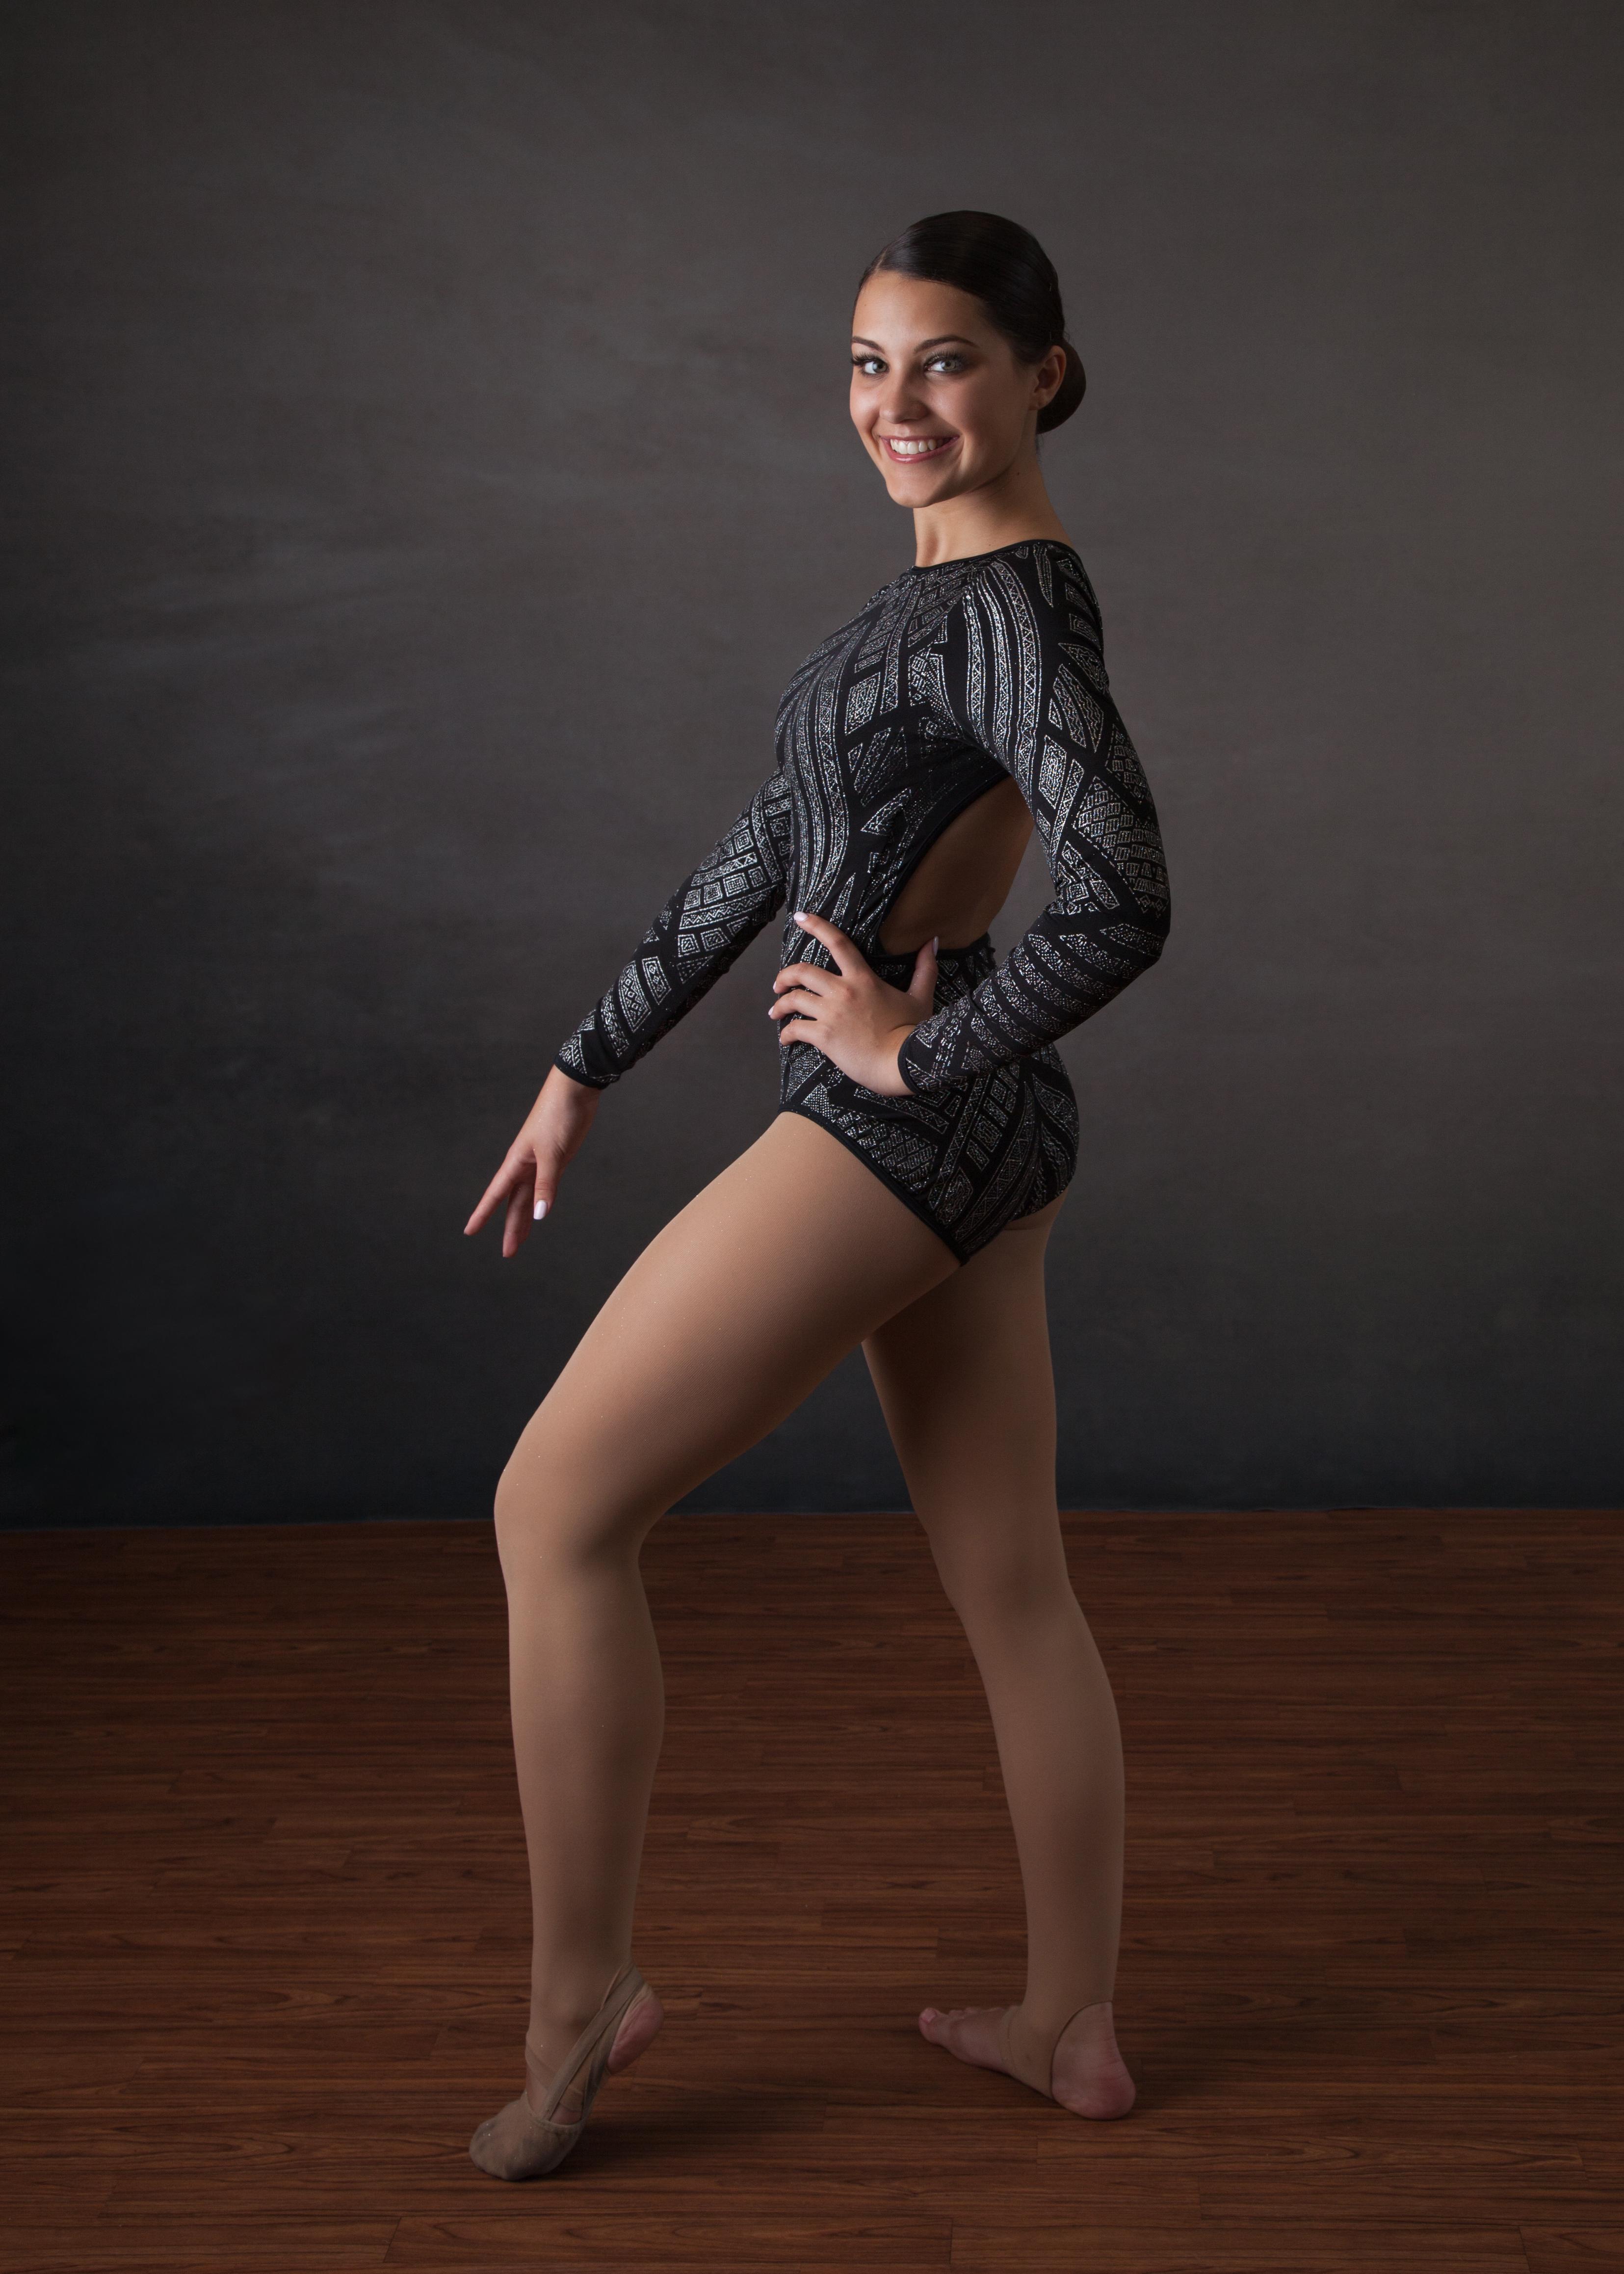 Michell Santelik Dance Photographer